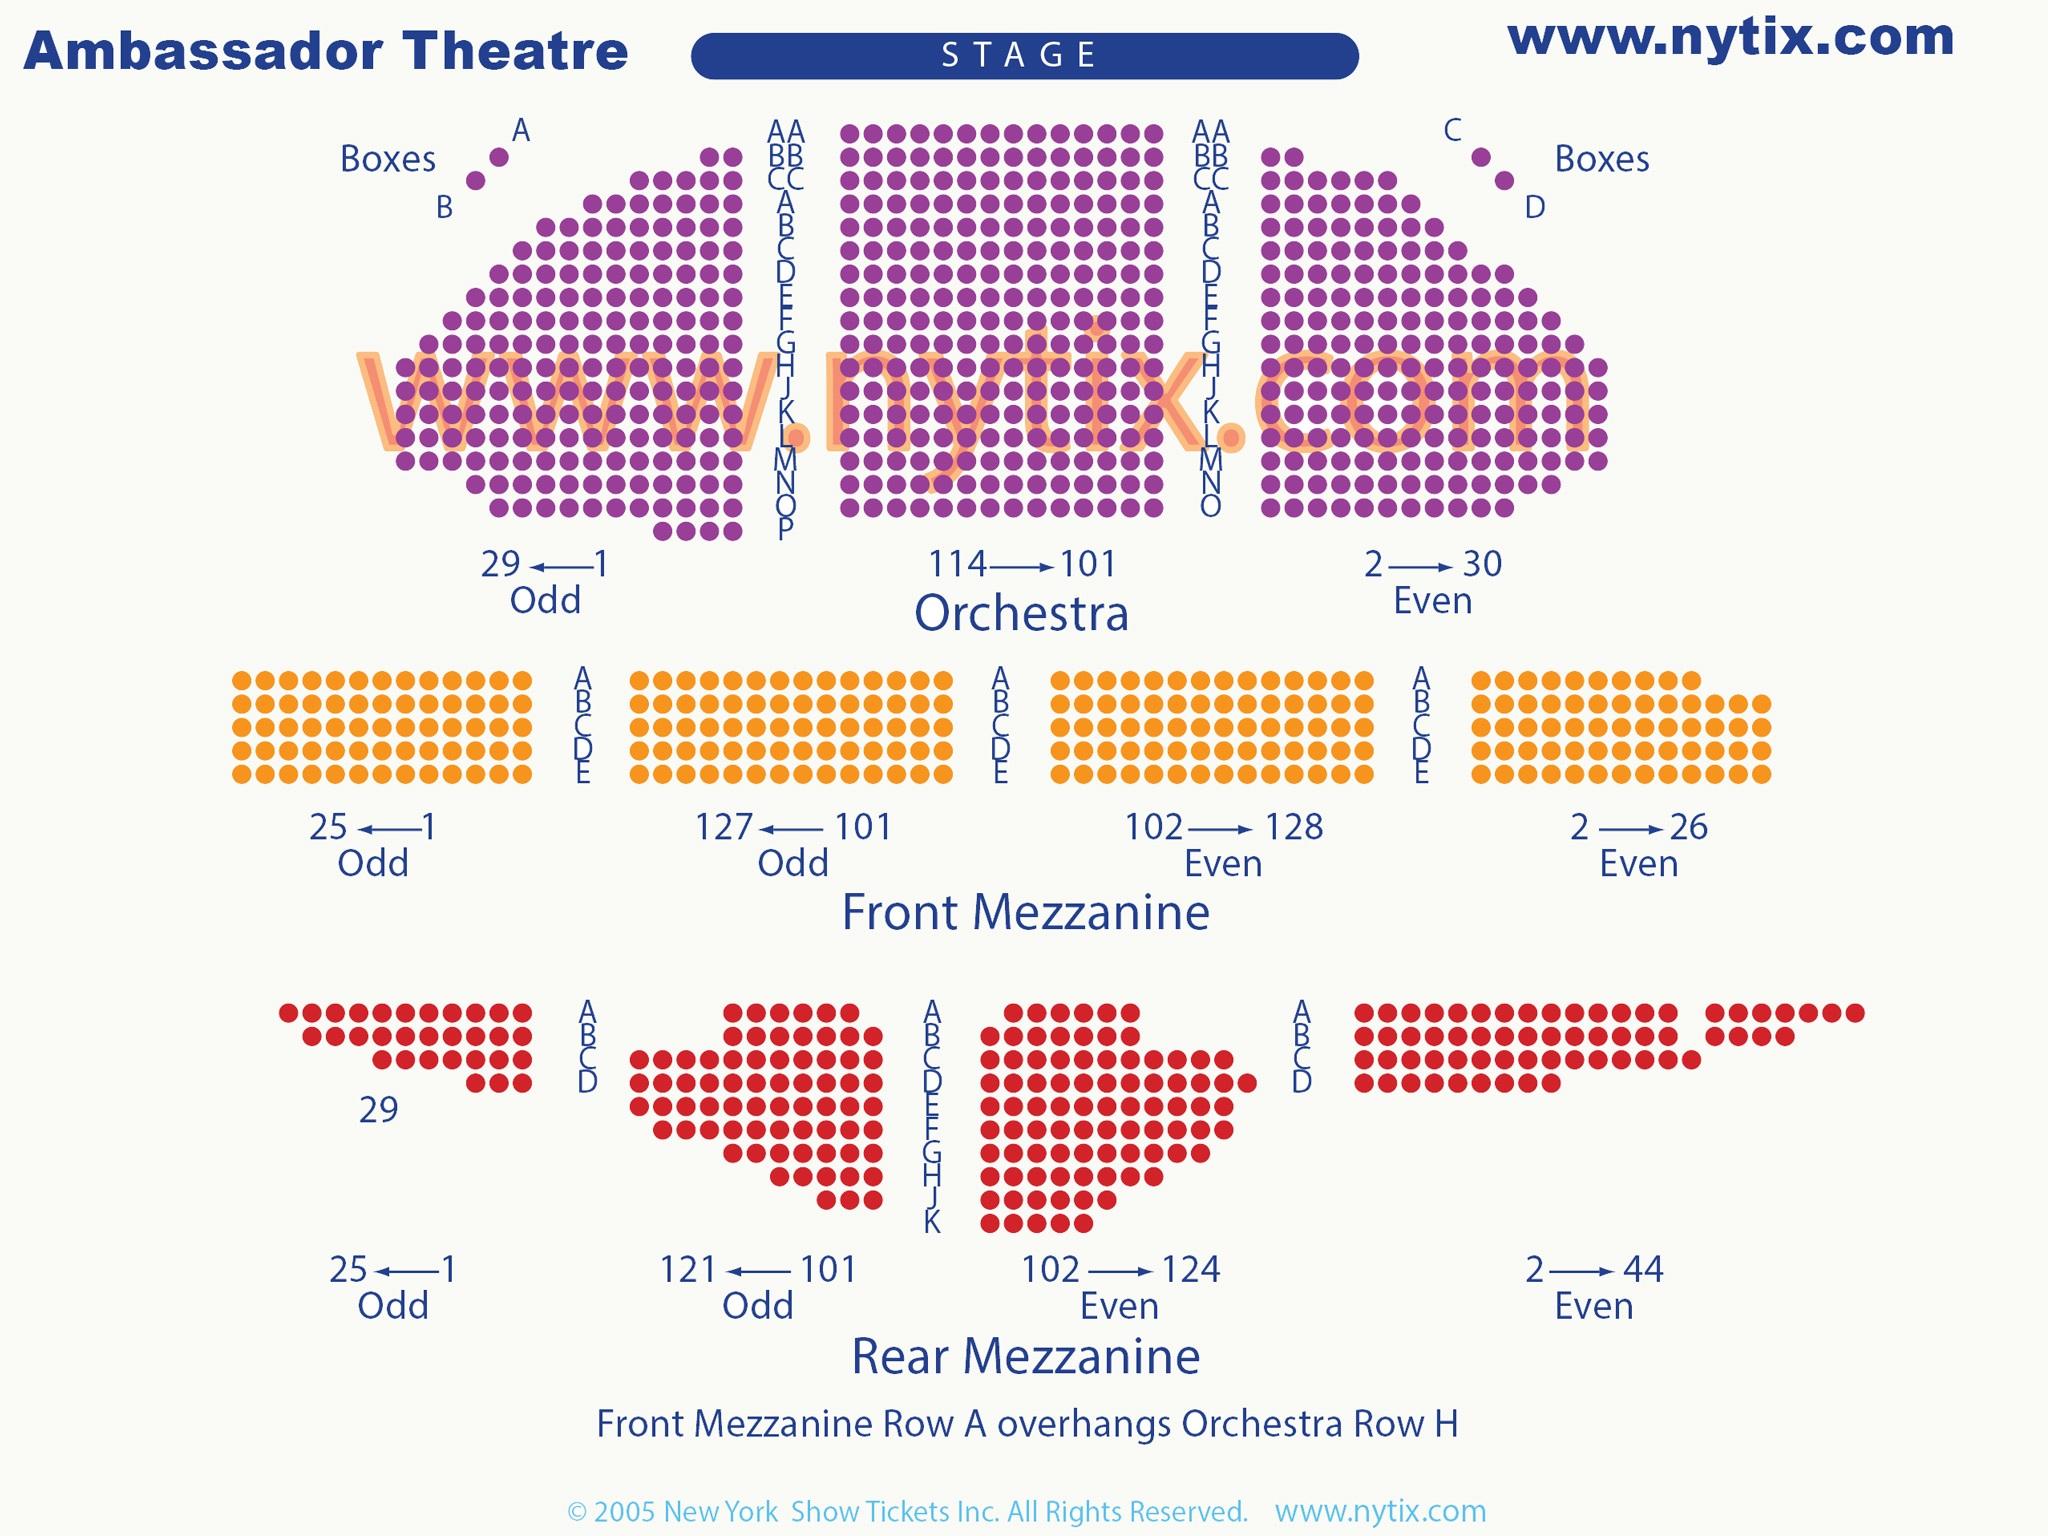 Ambassador Theatre Seating Chart